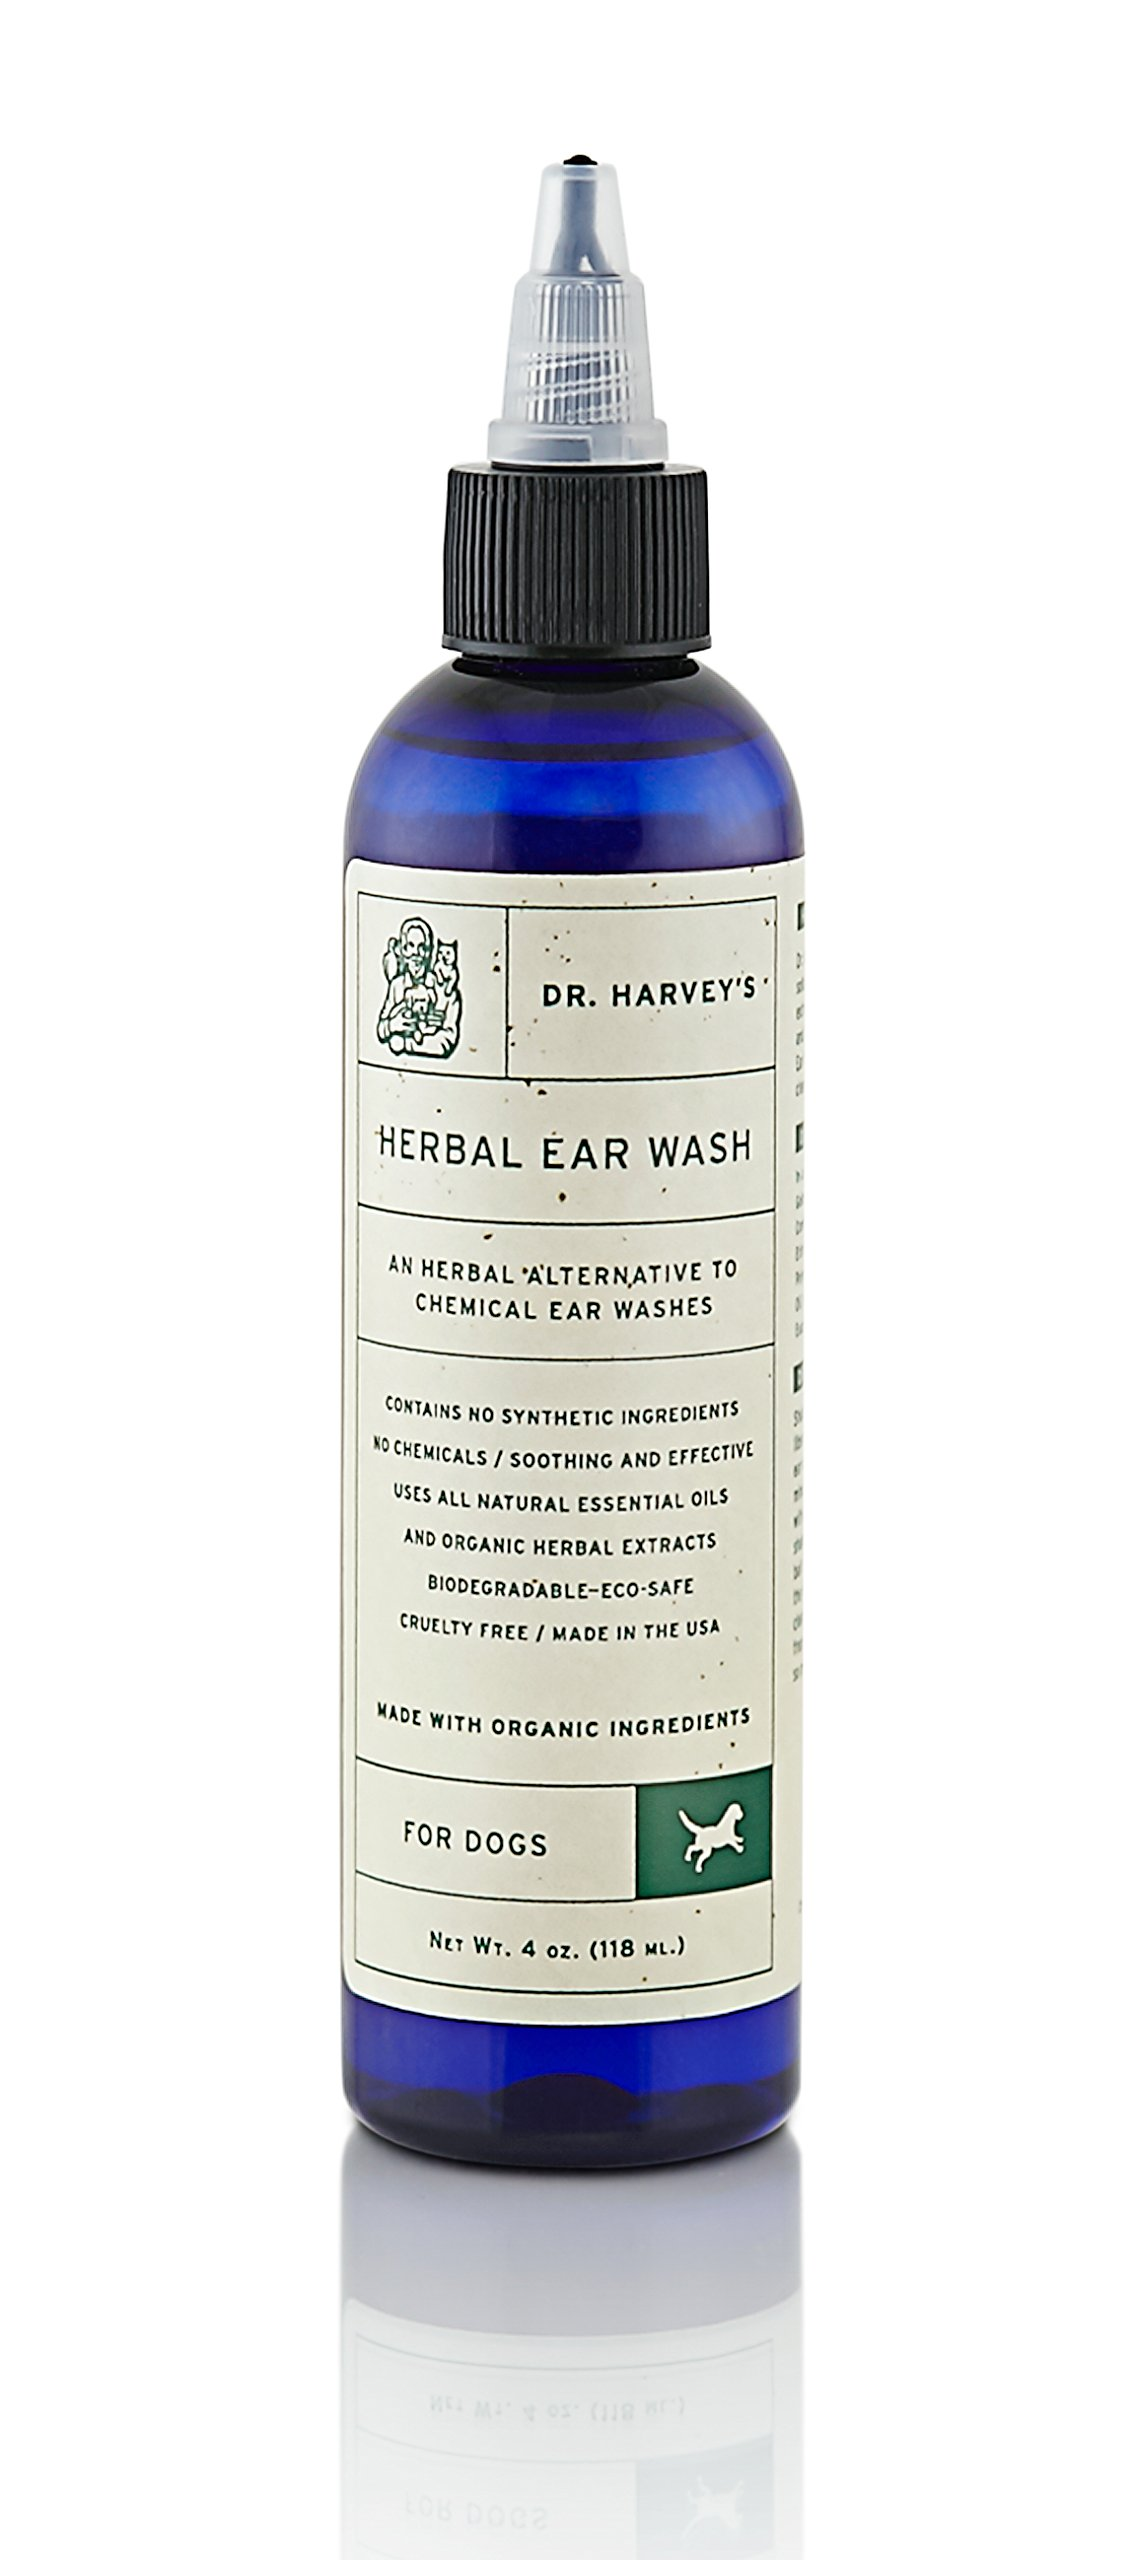 Dr. Harvey's Herbal Ear Wash for Dogs (4 oz. bottle)